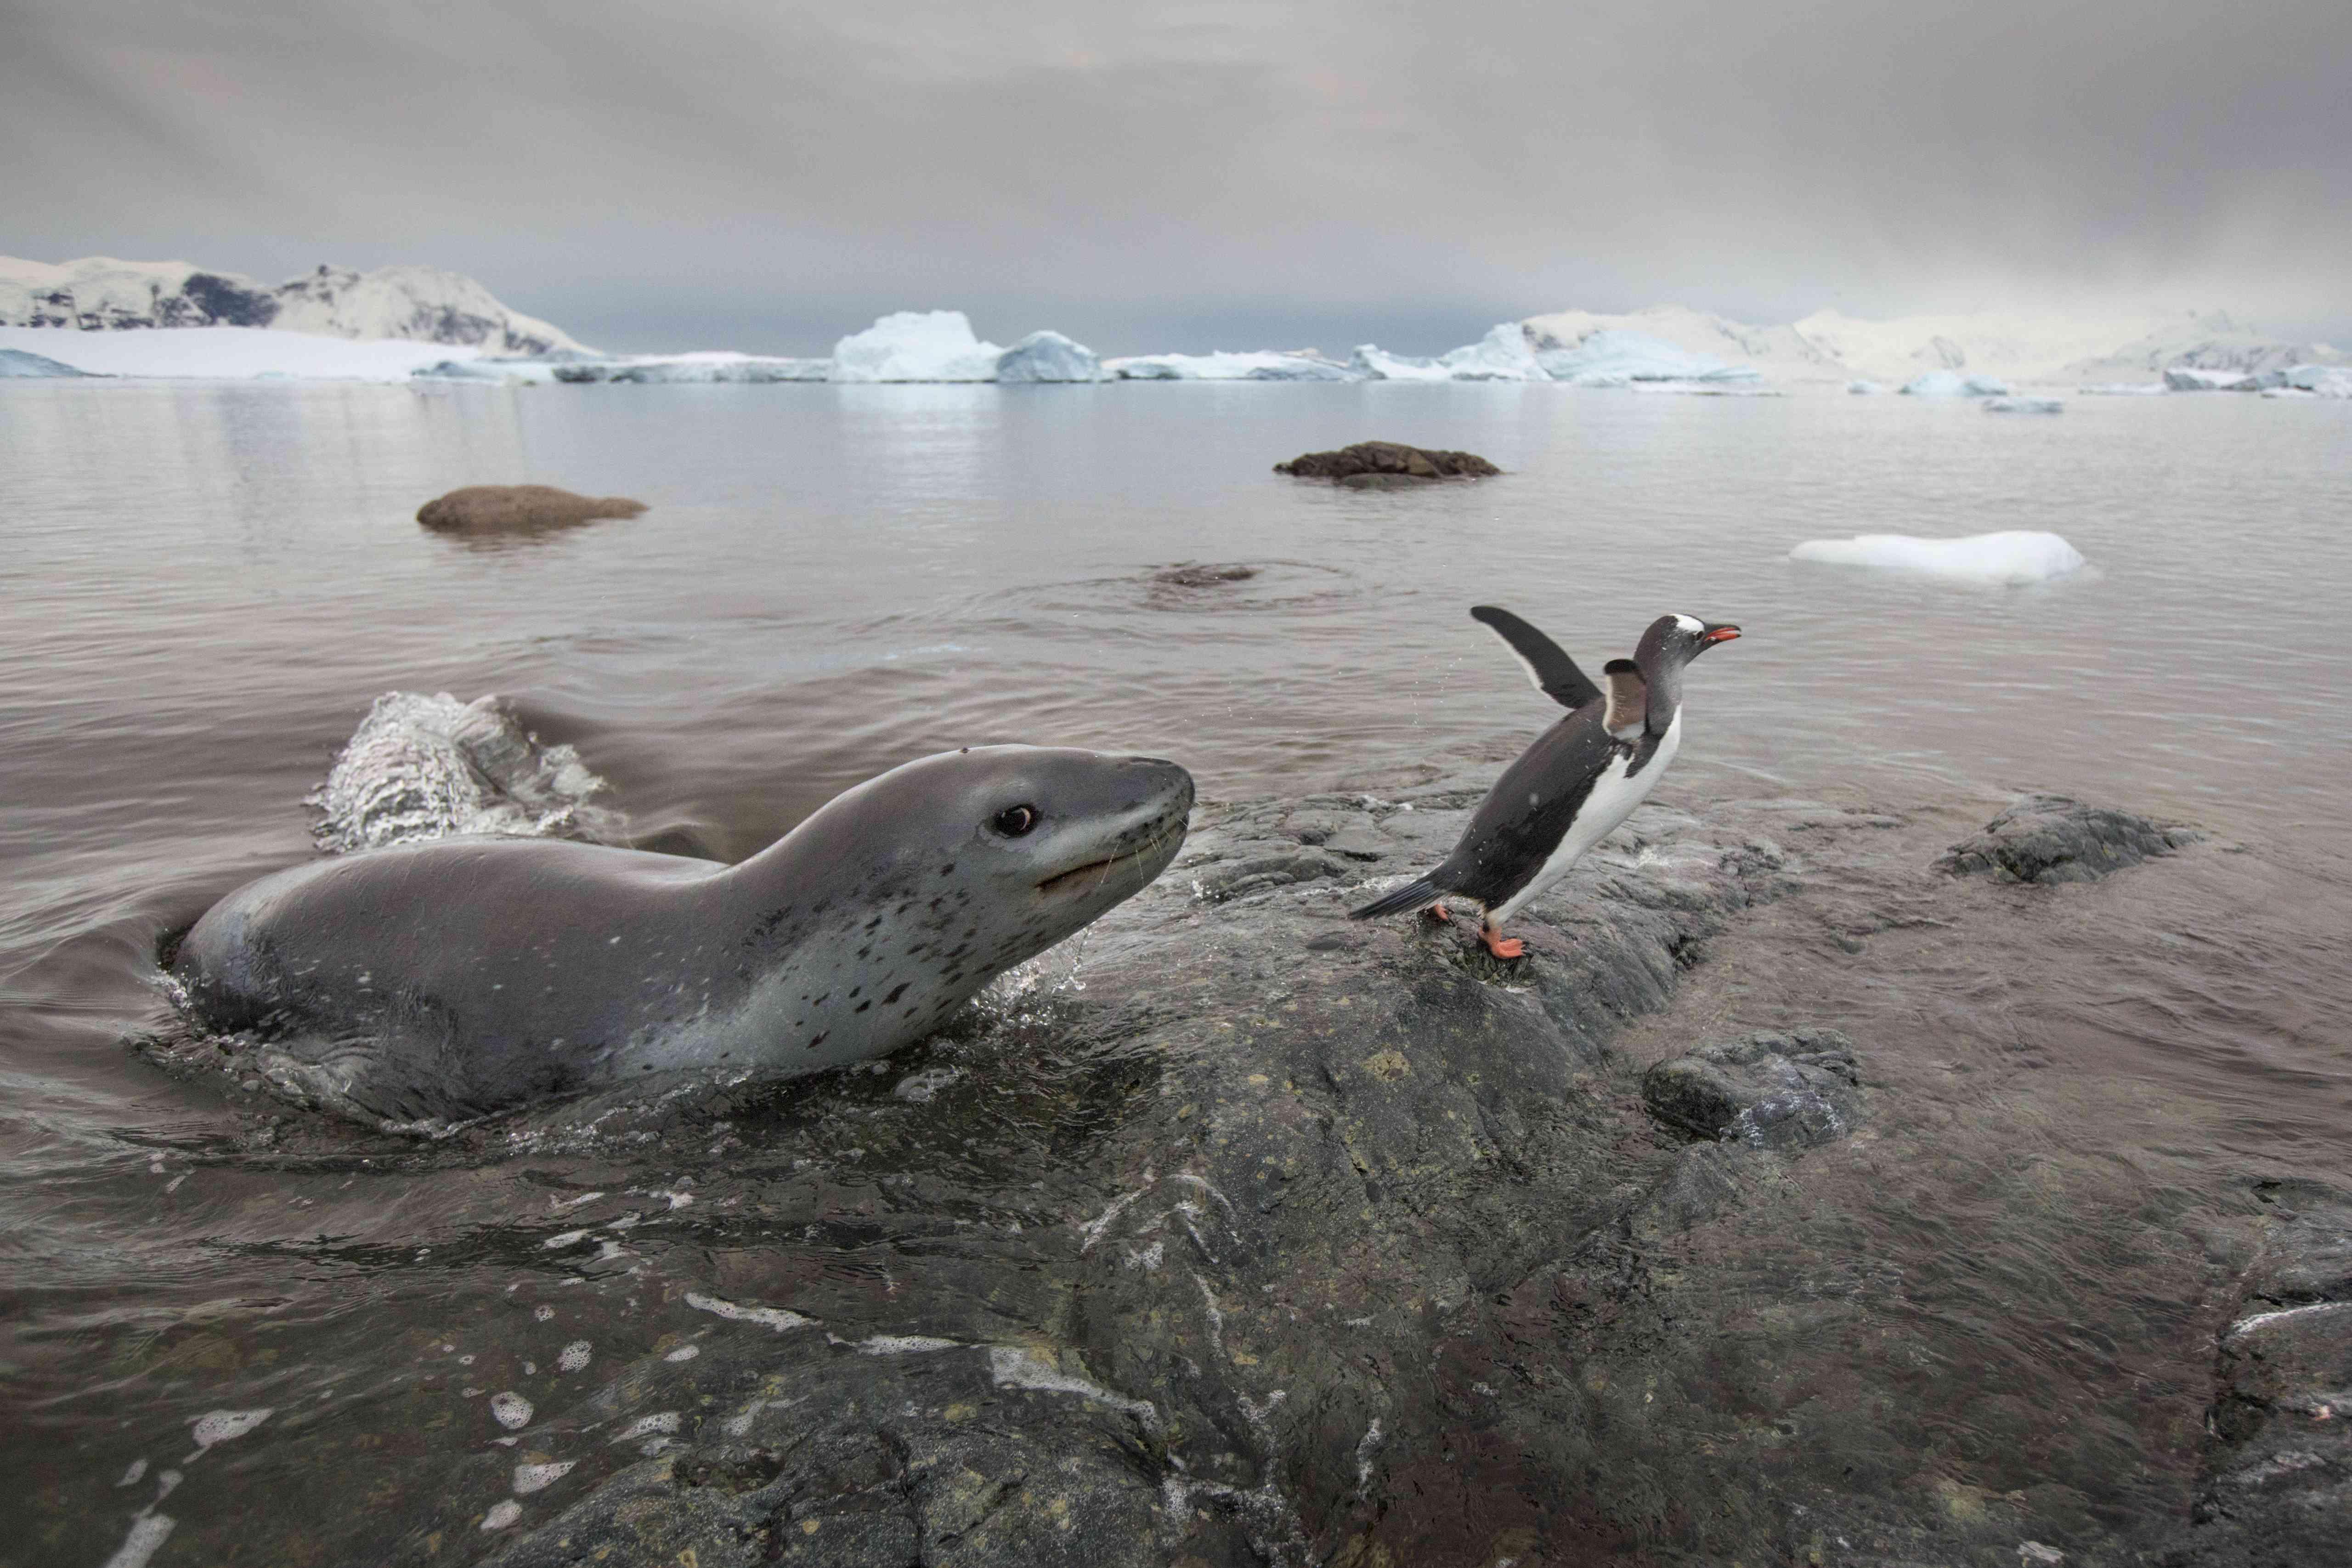 A leopard seal near a penguin in Antarctica